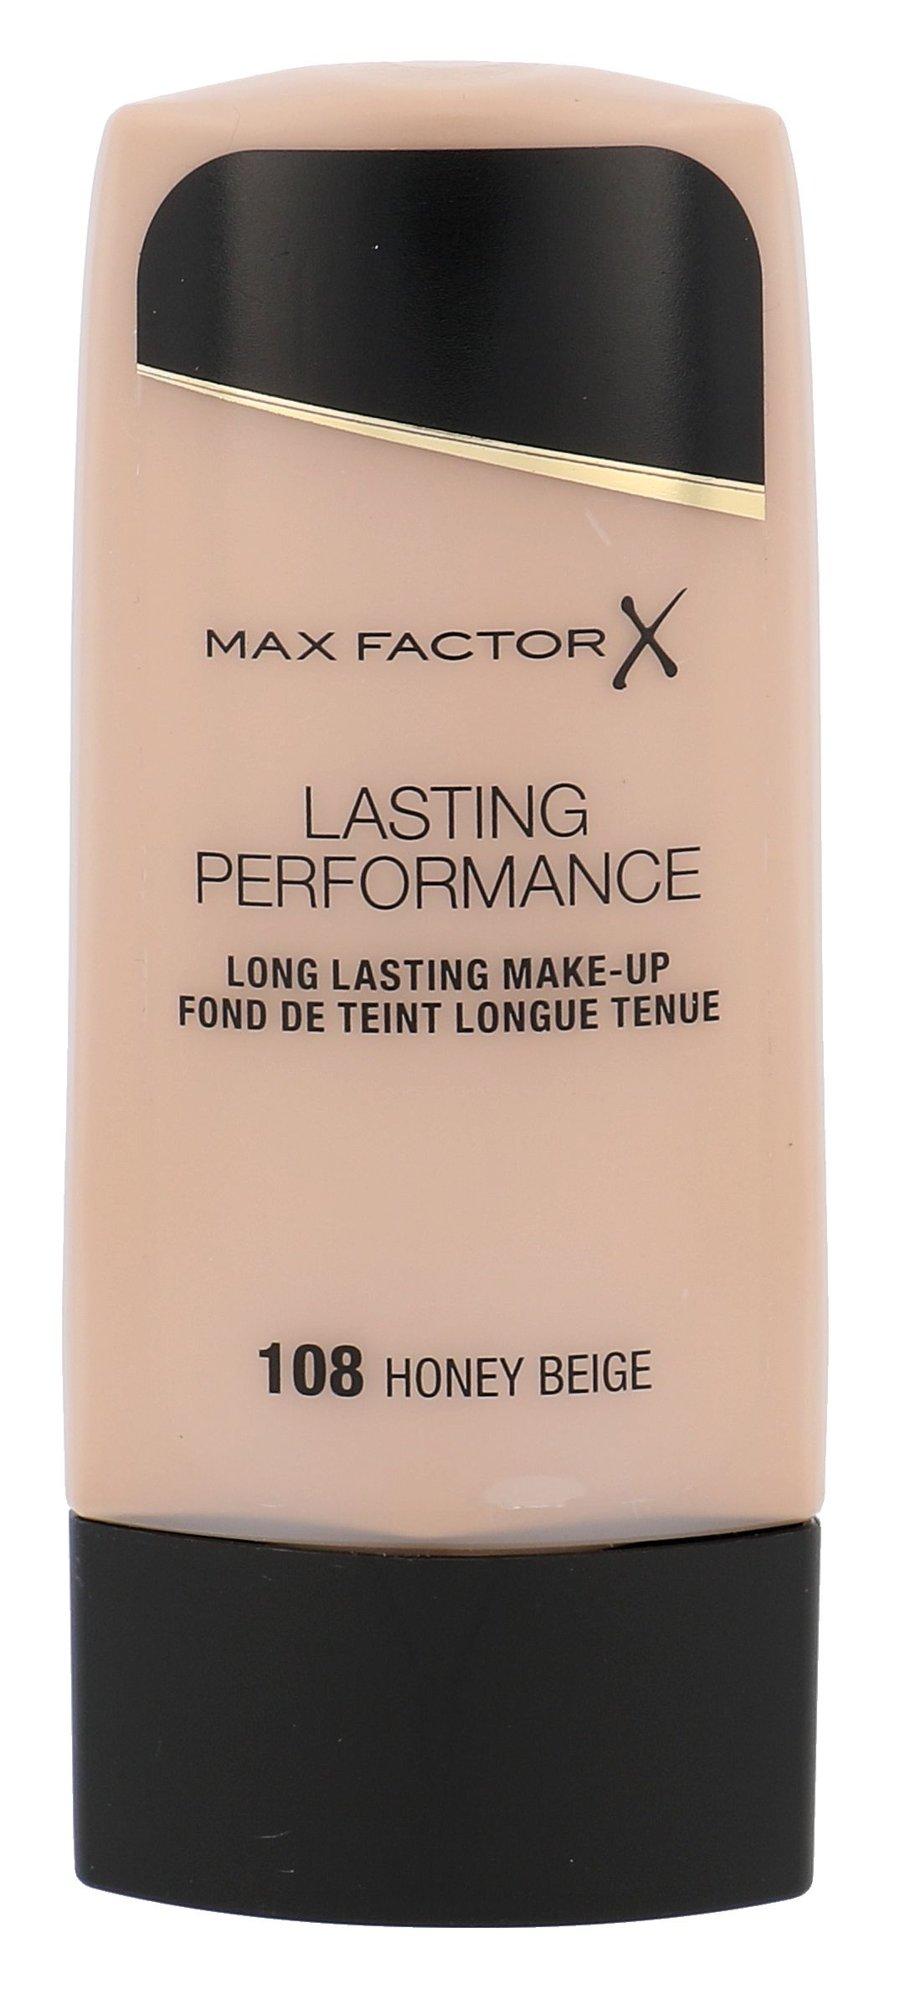 Max Factor Lasting Performance Cosmetic 35ml 108 Honey Beige